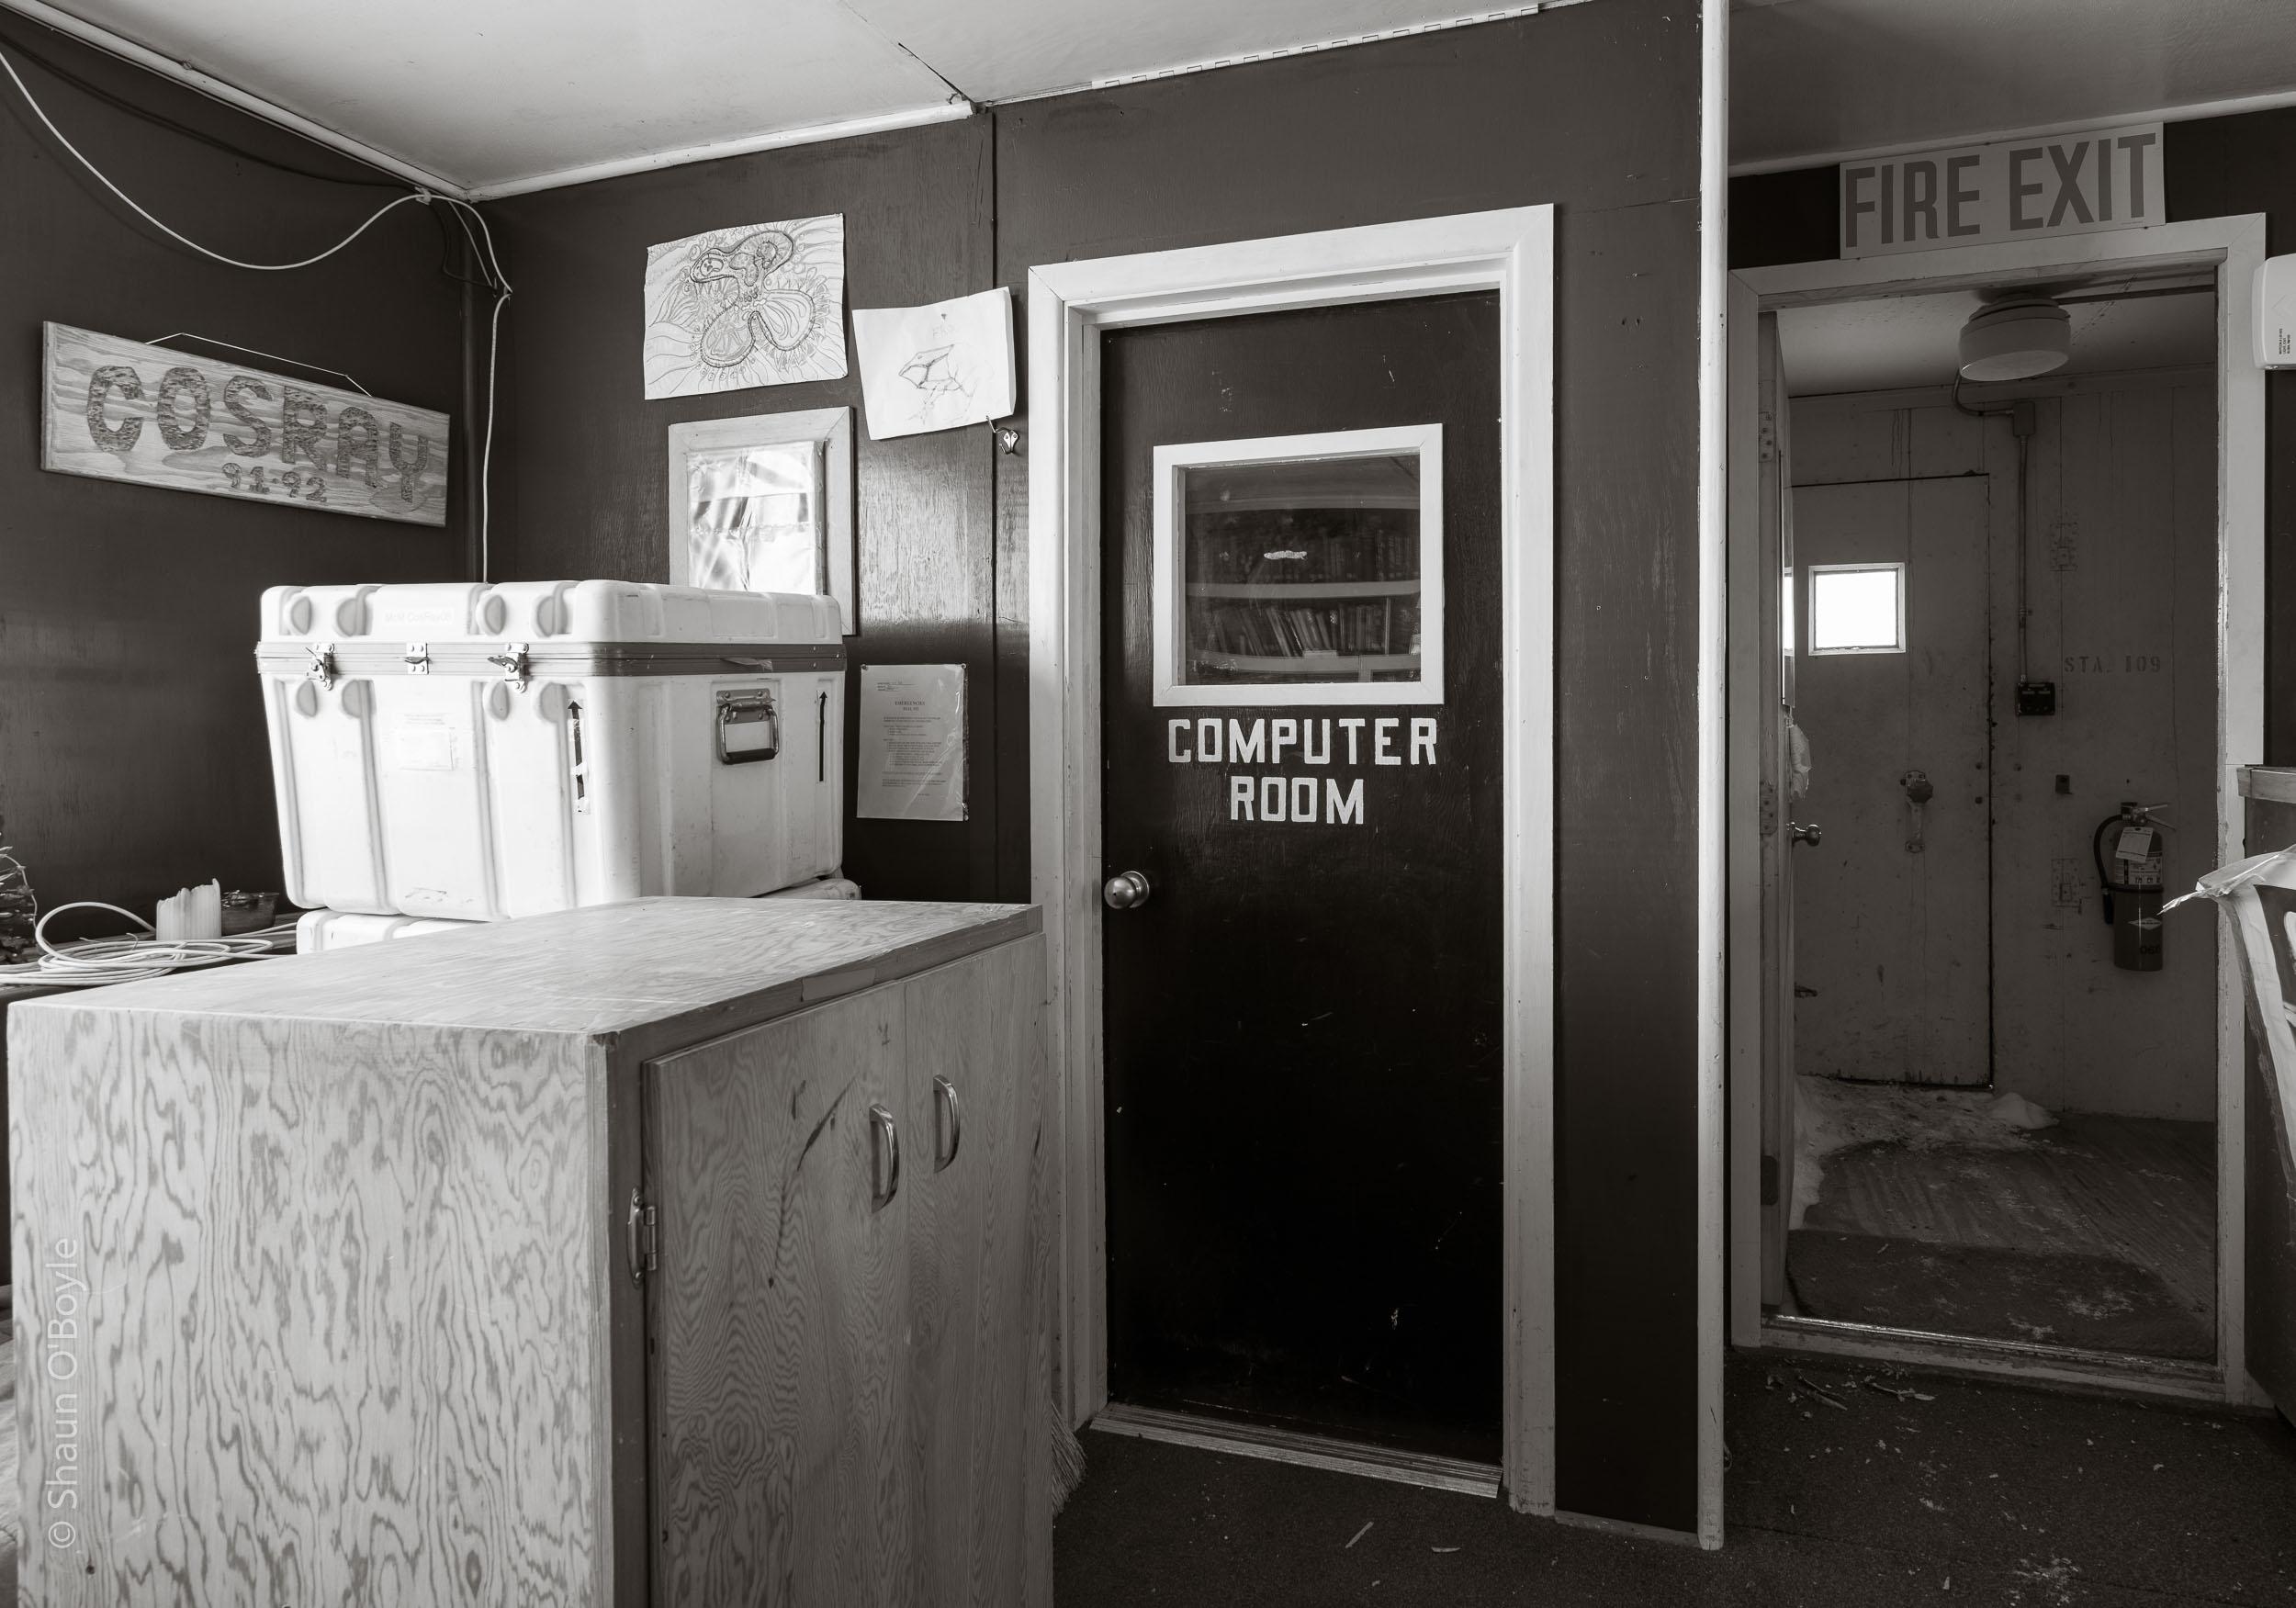 CosRay, McMurdo Station